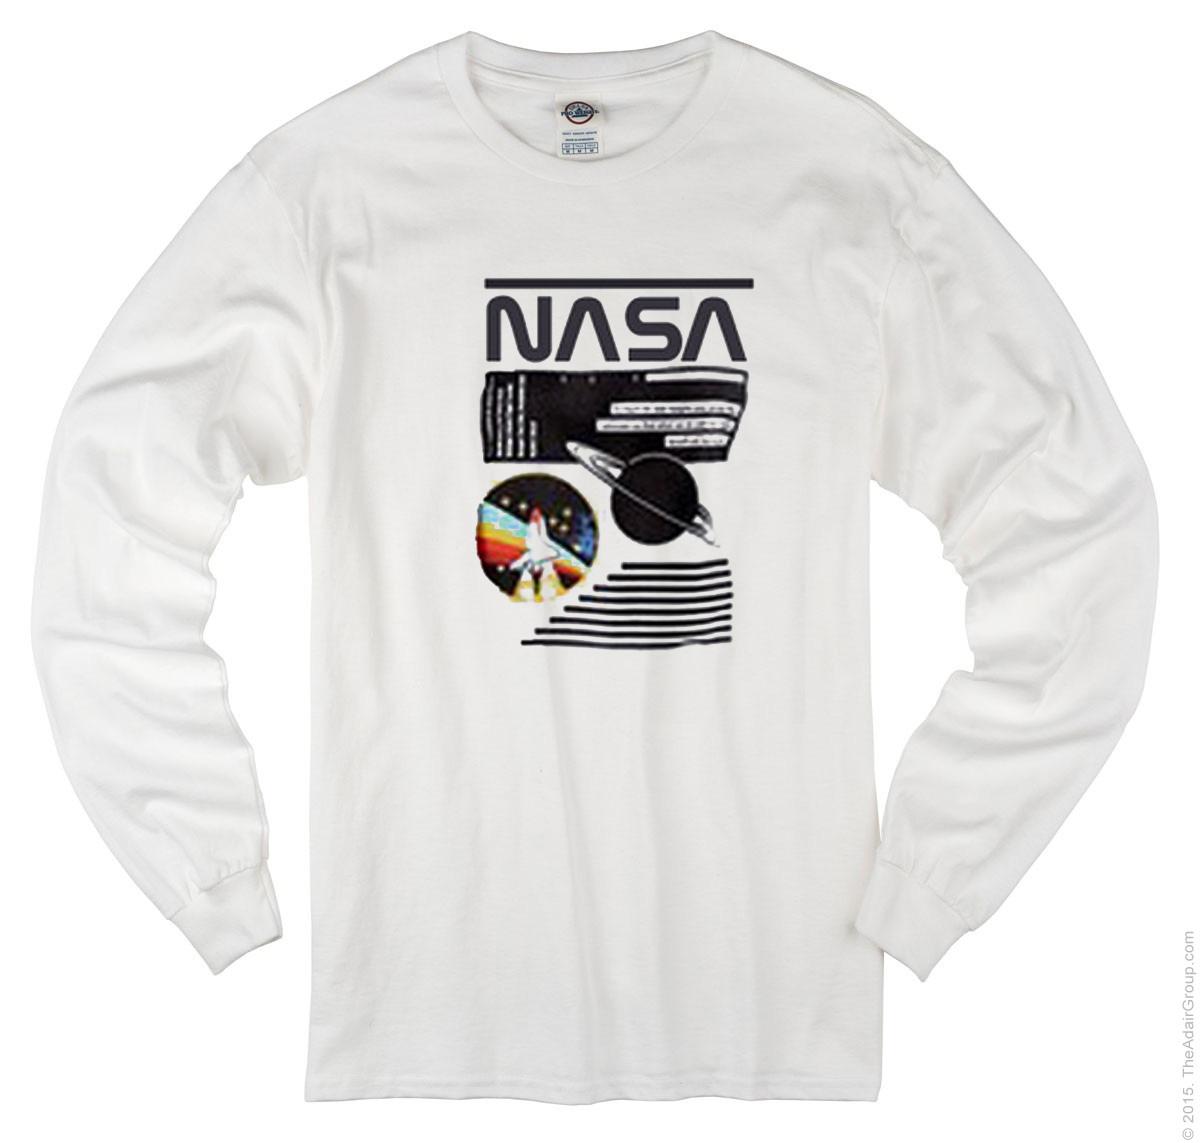 5c9d16f8edf051 Nasa Long Sleeve T-shirt